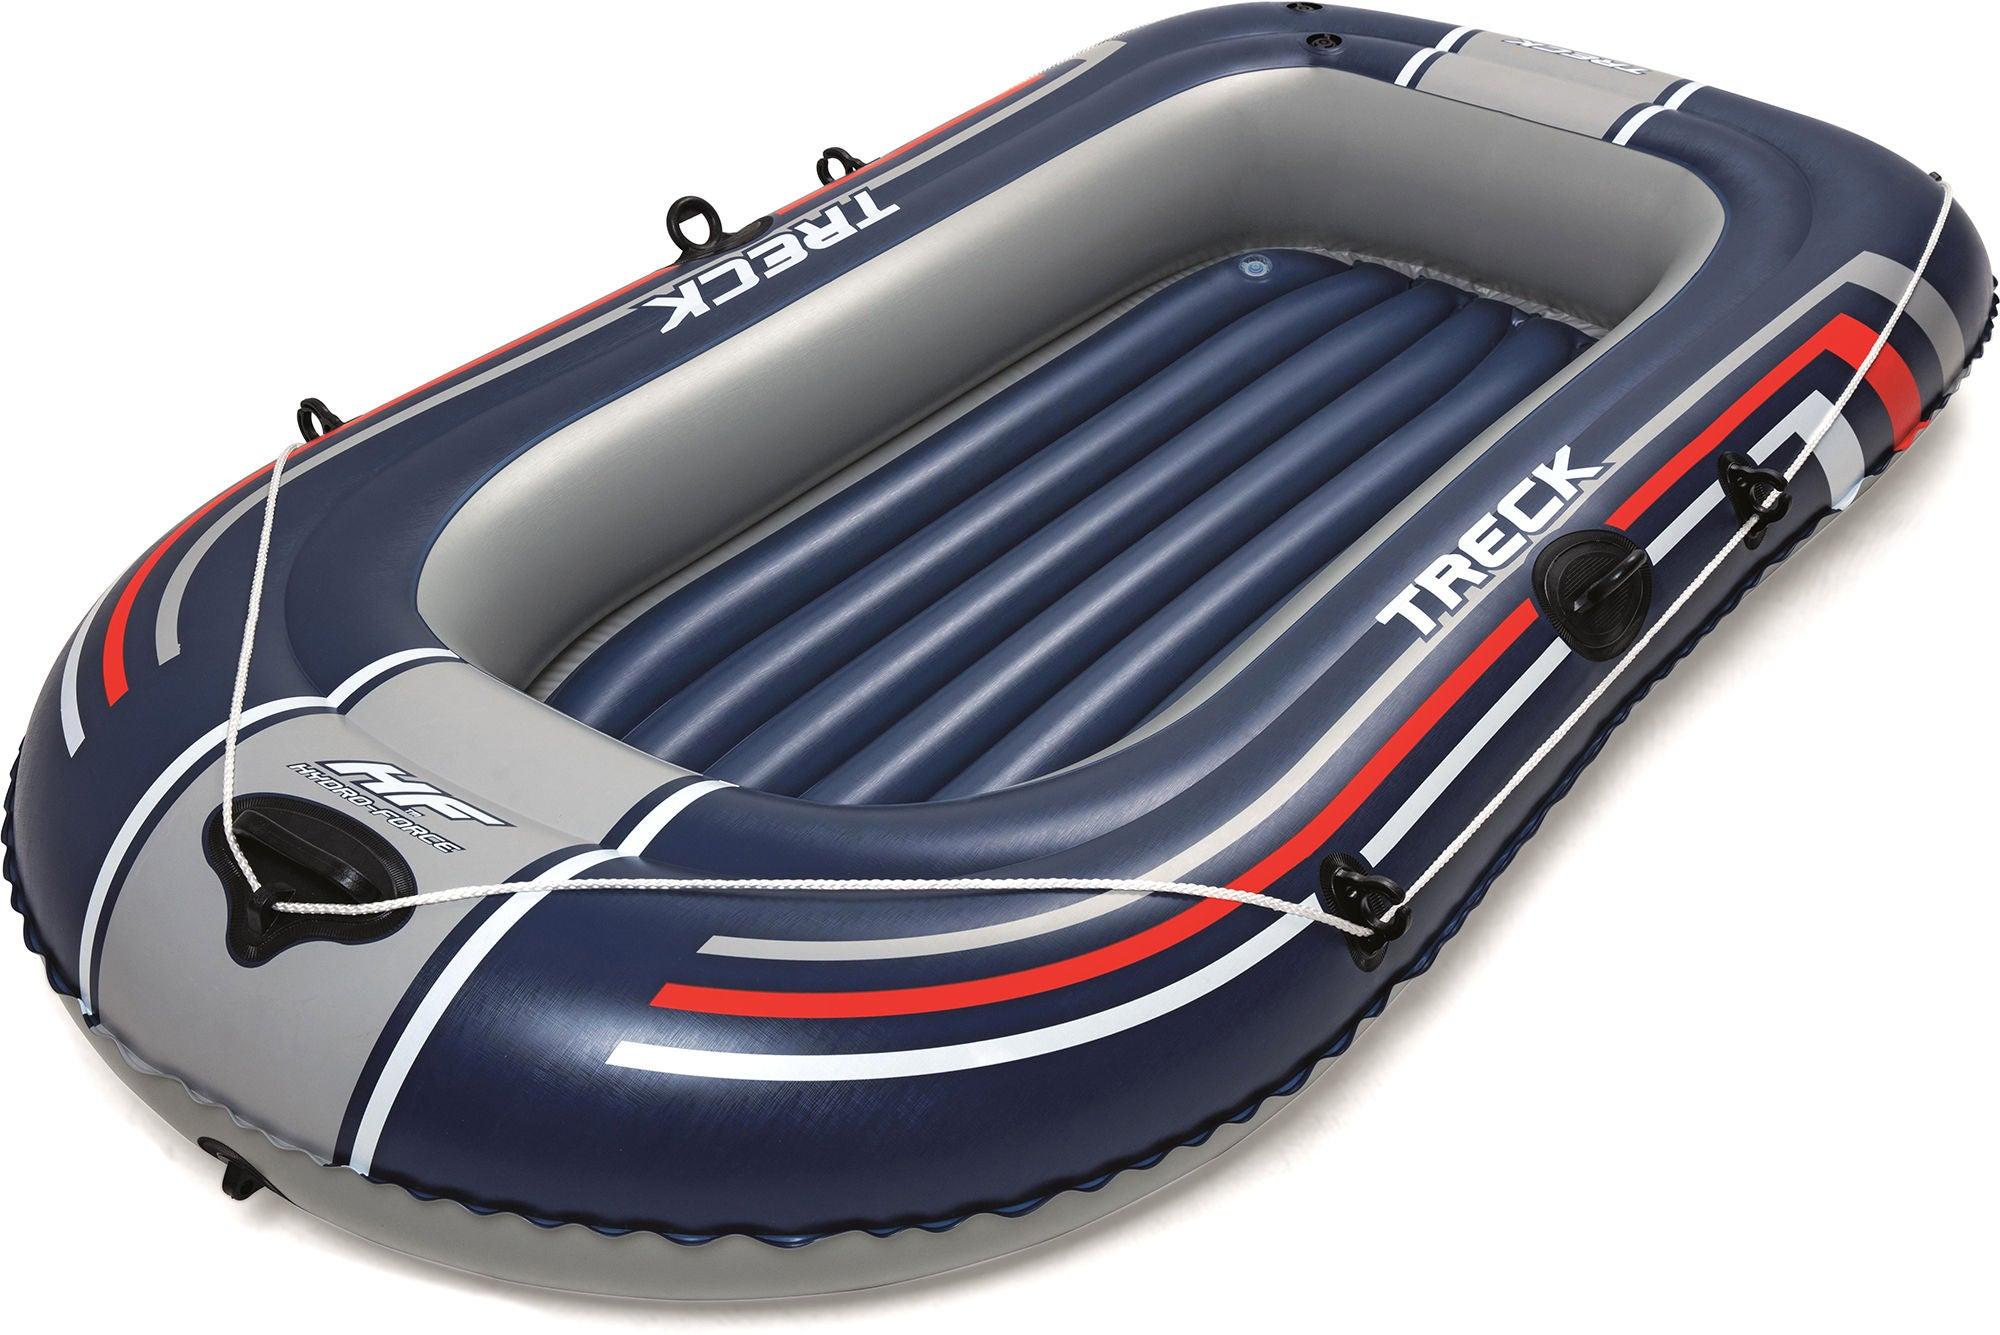 Bestway Hydro-Force Gummibåt Treck X1 2,28x1,21m